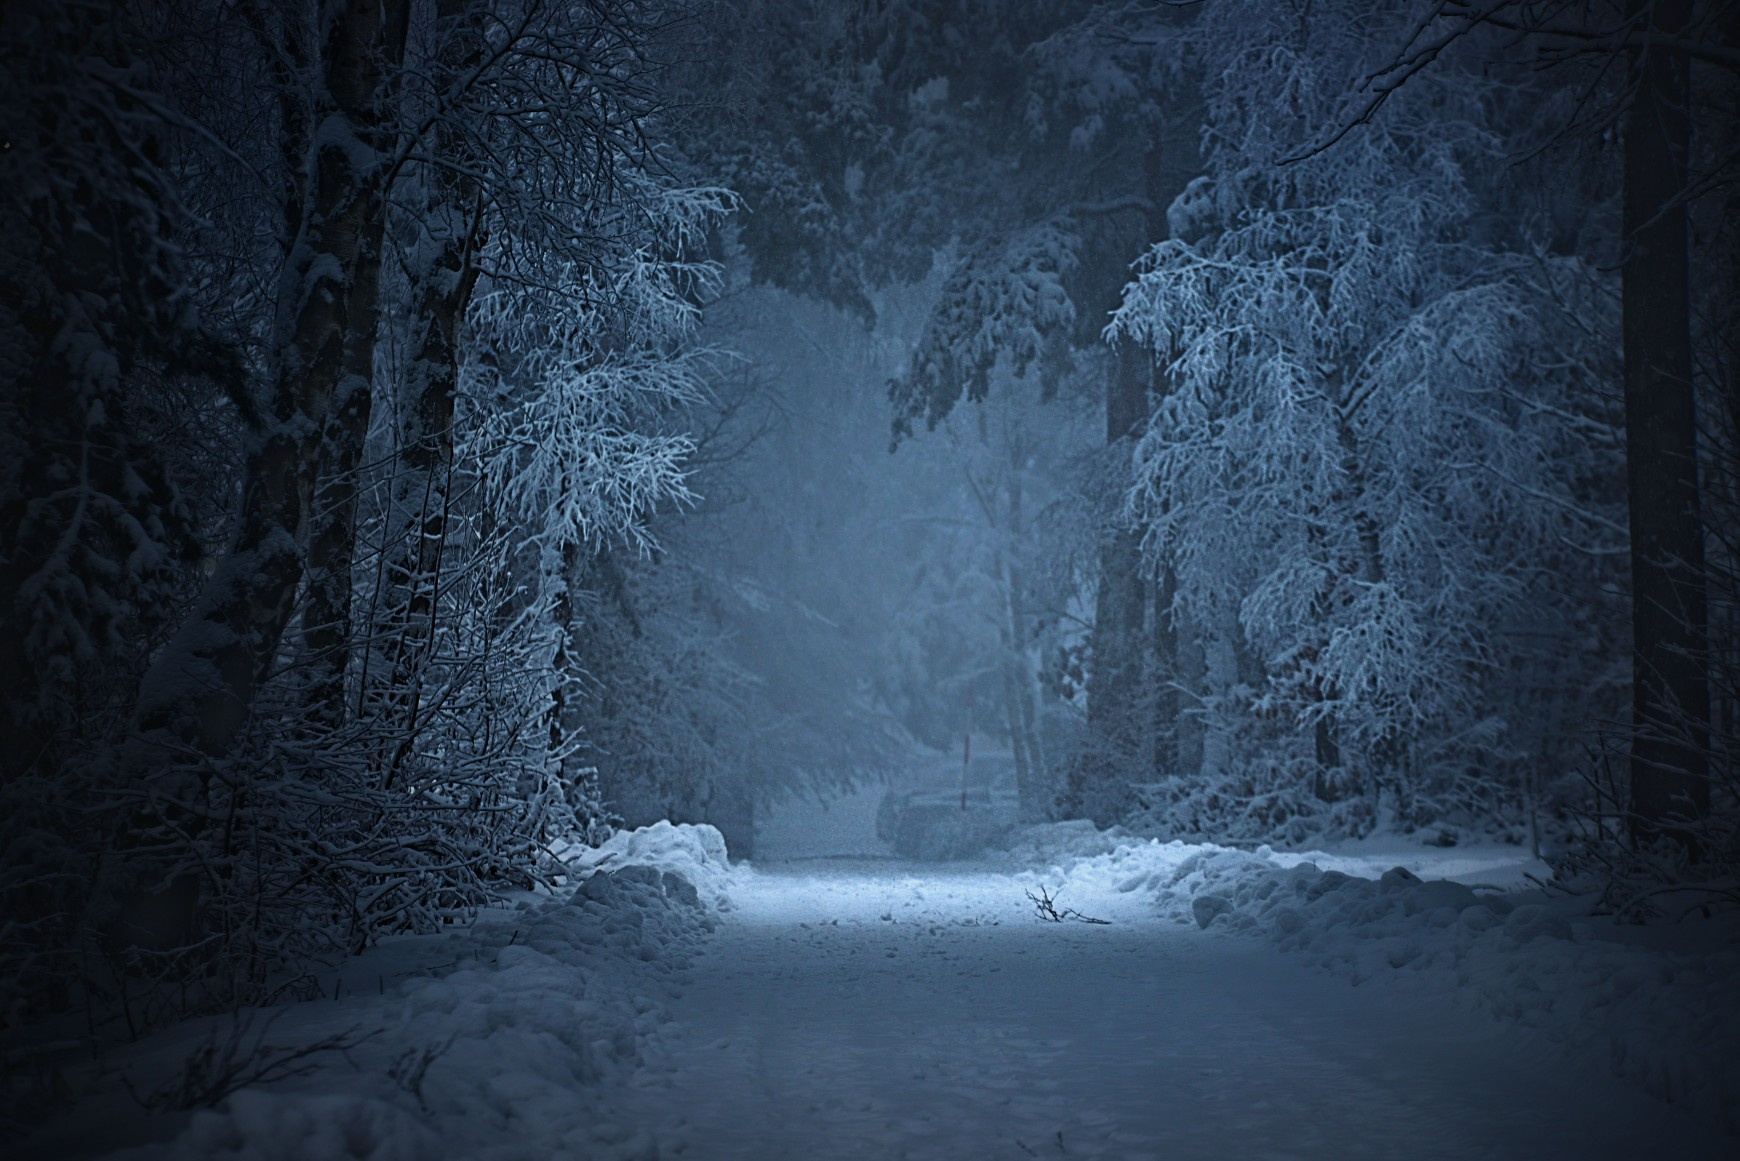 Lob des Winters